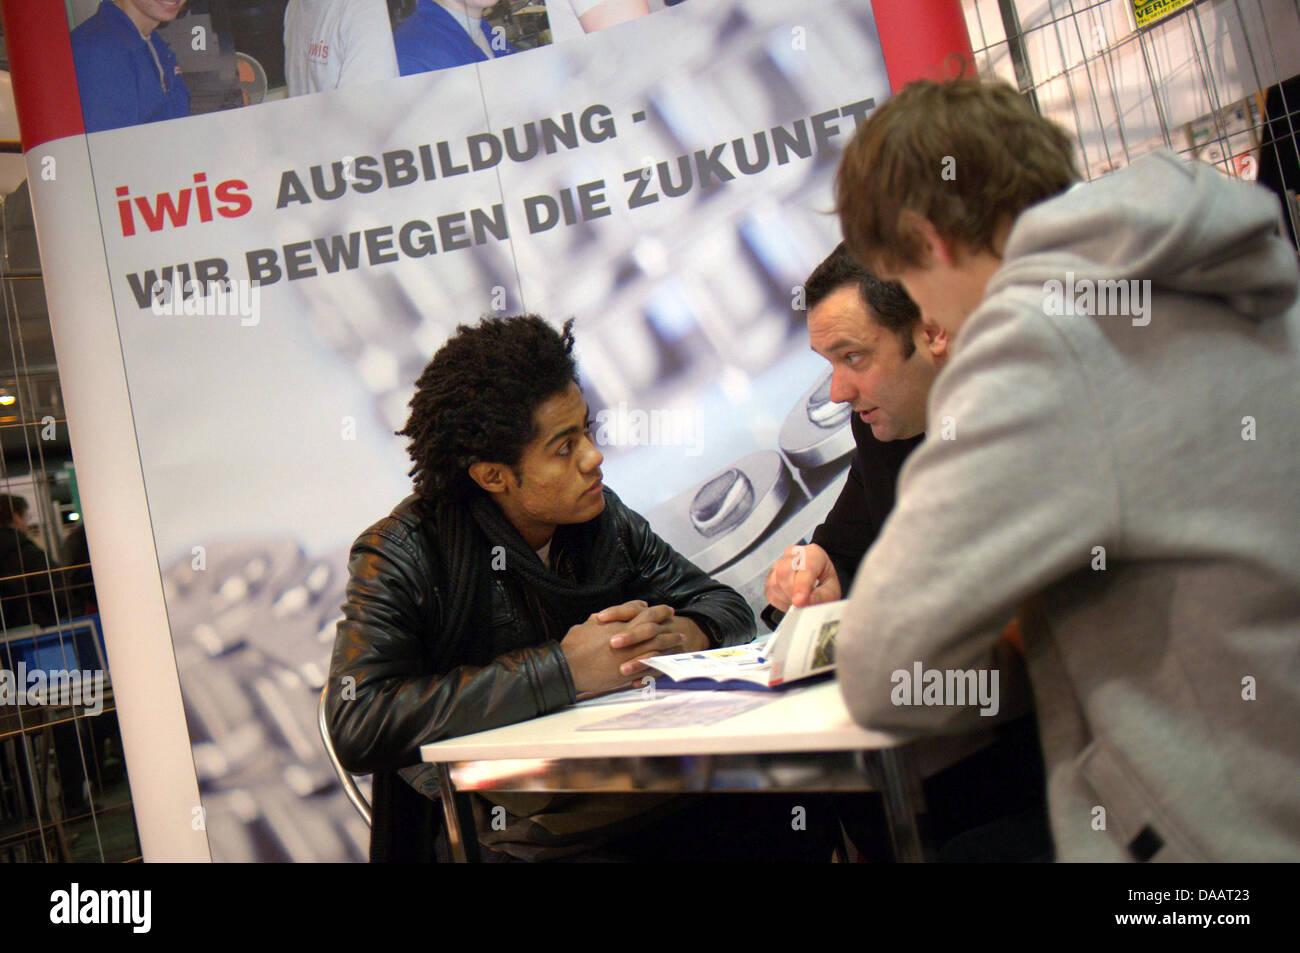 nopeus dating Troyes 2013360 dating ja tapahtumia